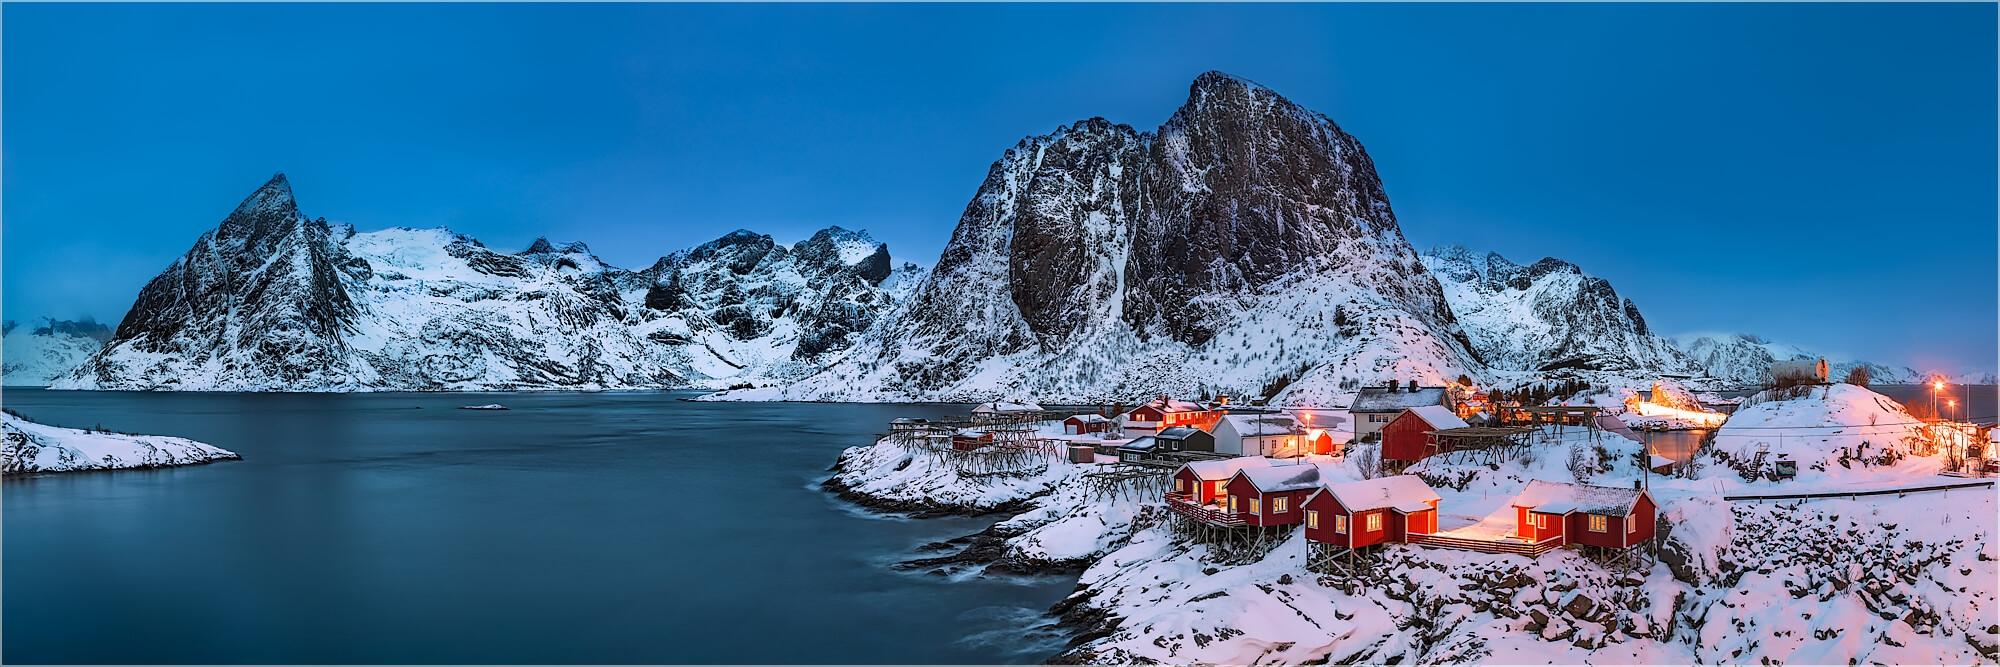 Panoramabild Polartag in Hamnøy Lofoten Norwegen